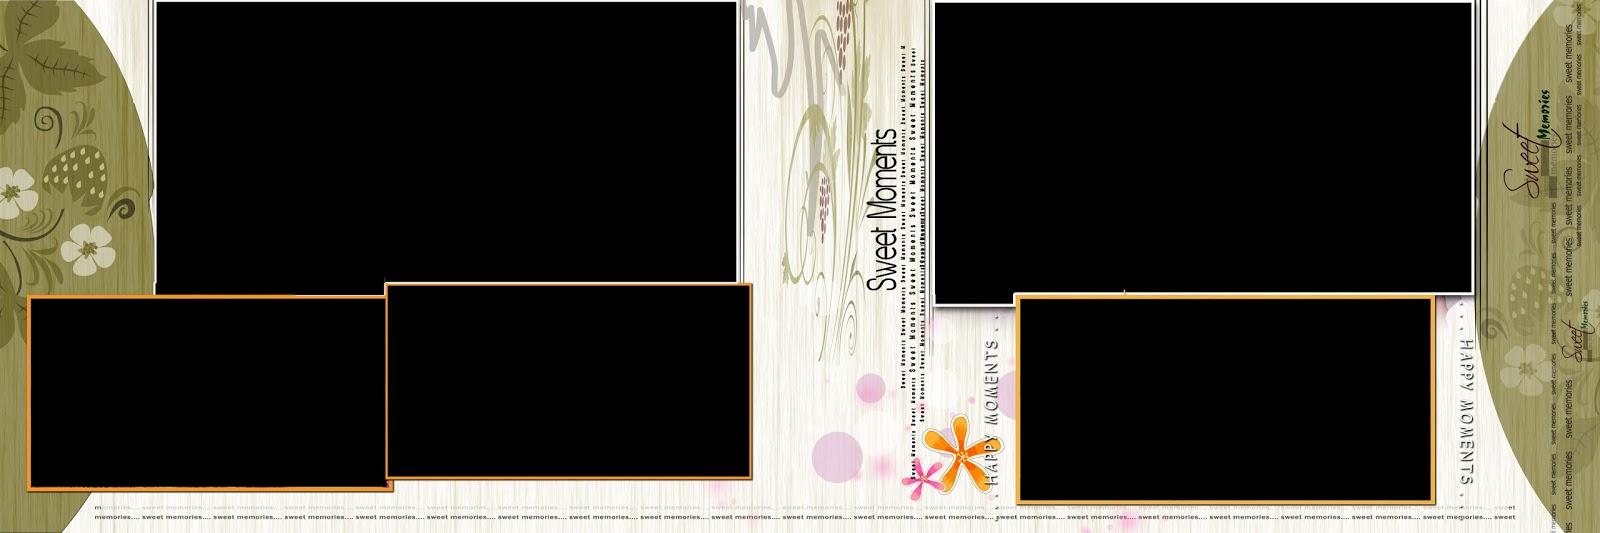 Canvera Album Design Picture Barfi Movie Priyanka Design